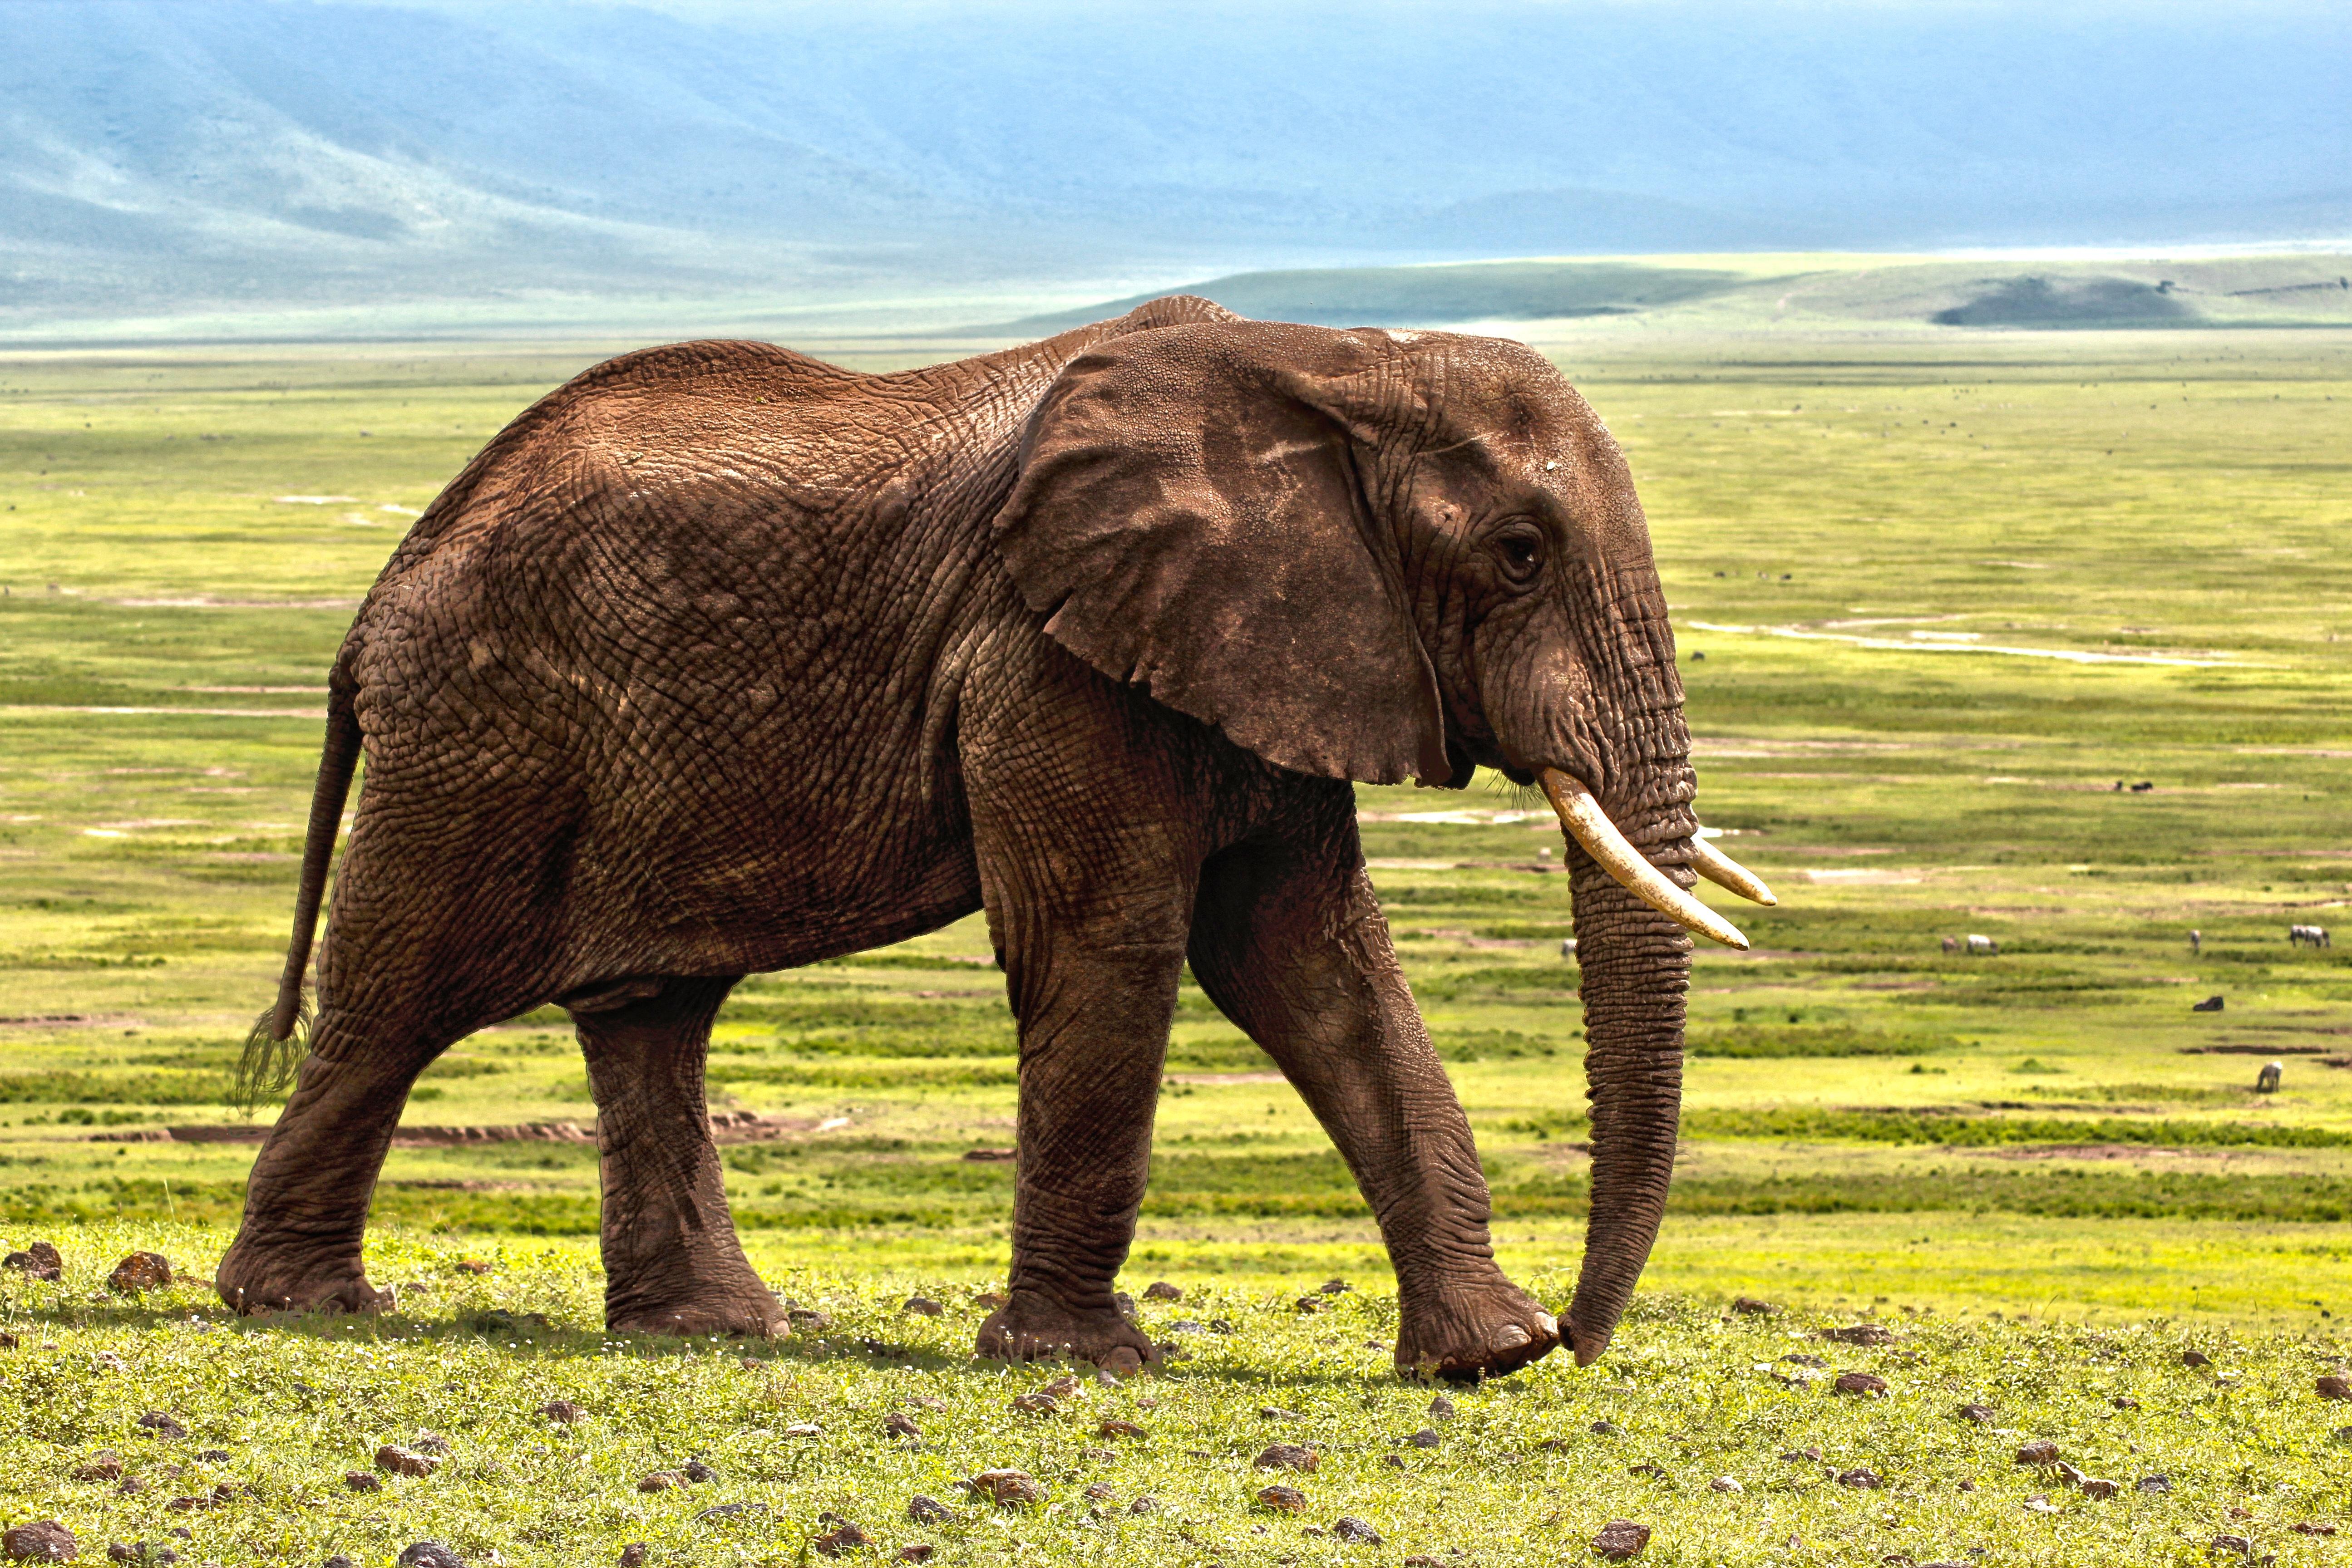 Images Gratuites La Nature Herbe Aventure Animal Faune Zoo